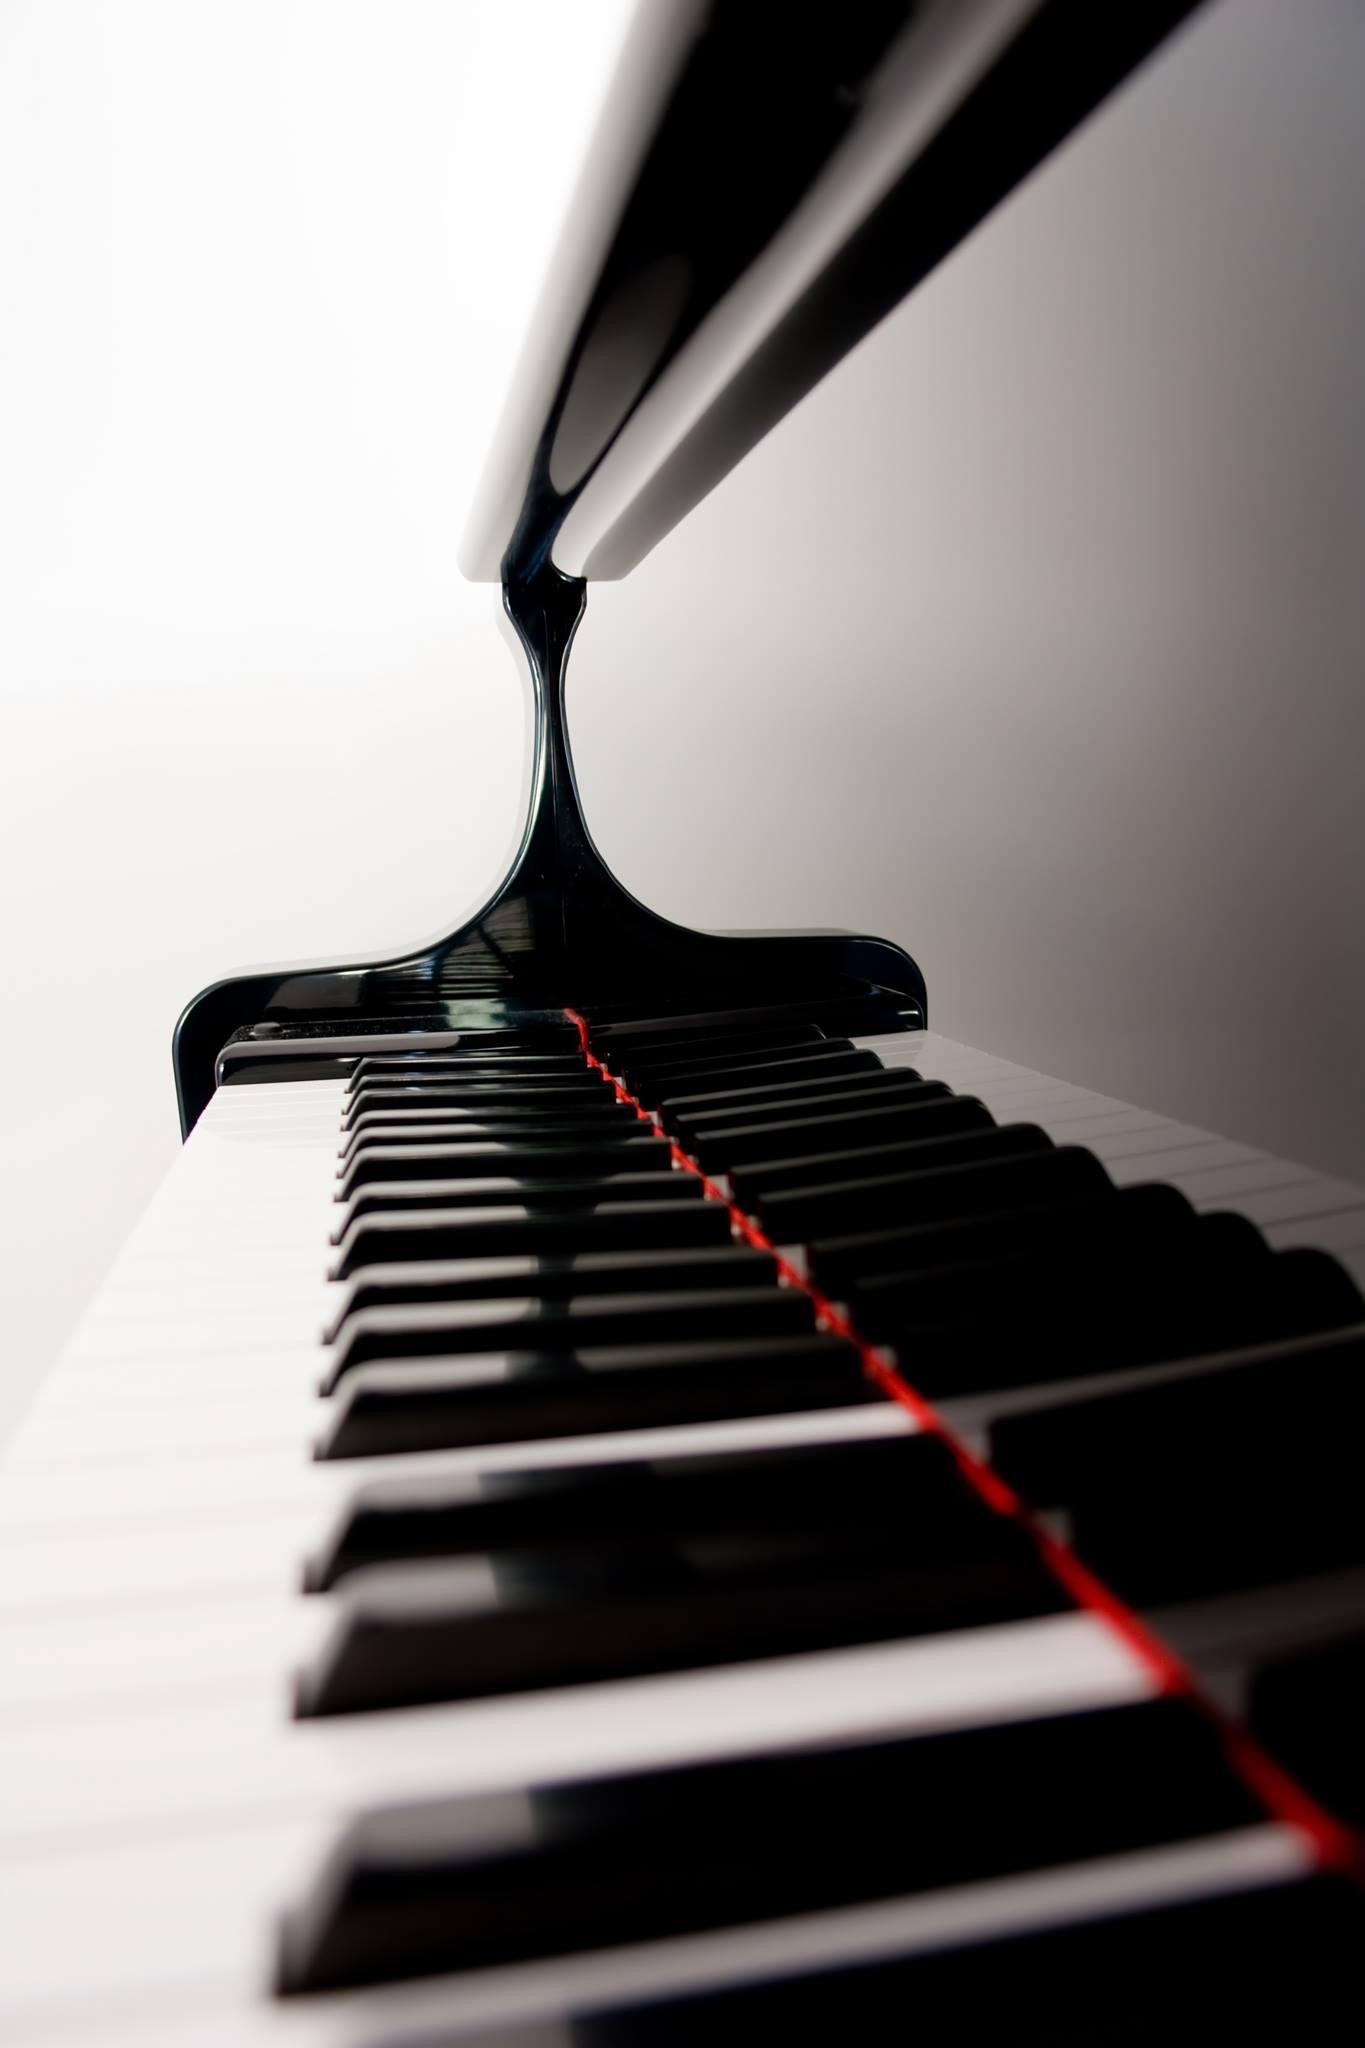 pianio hang photo.jpg